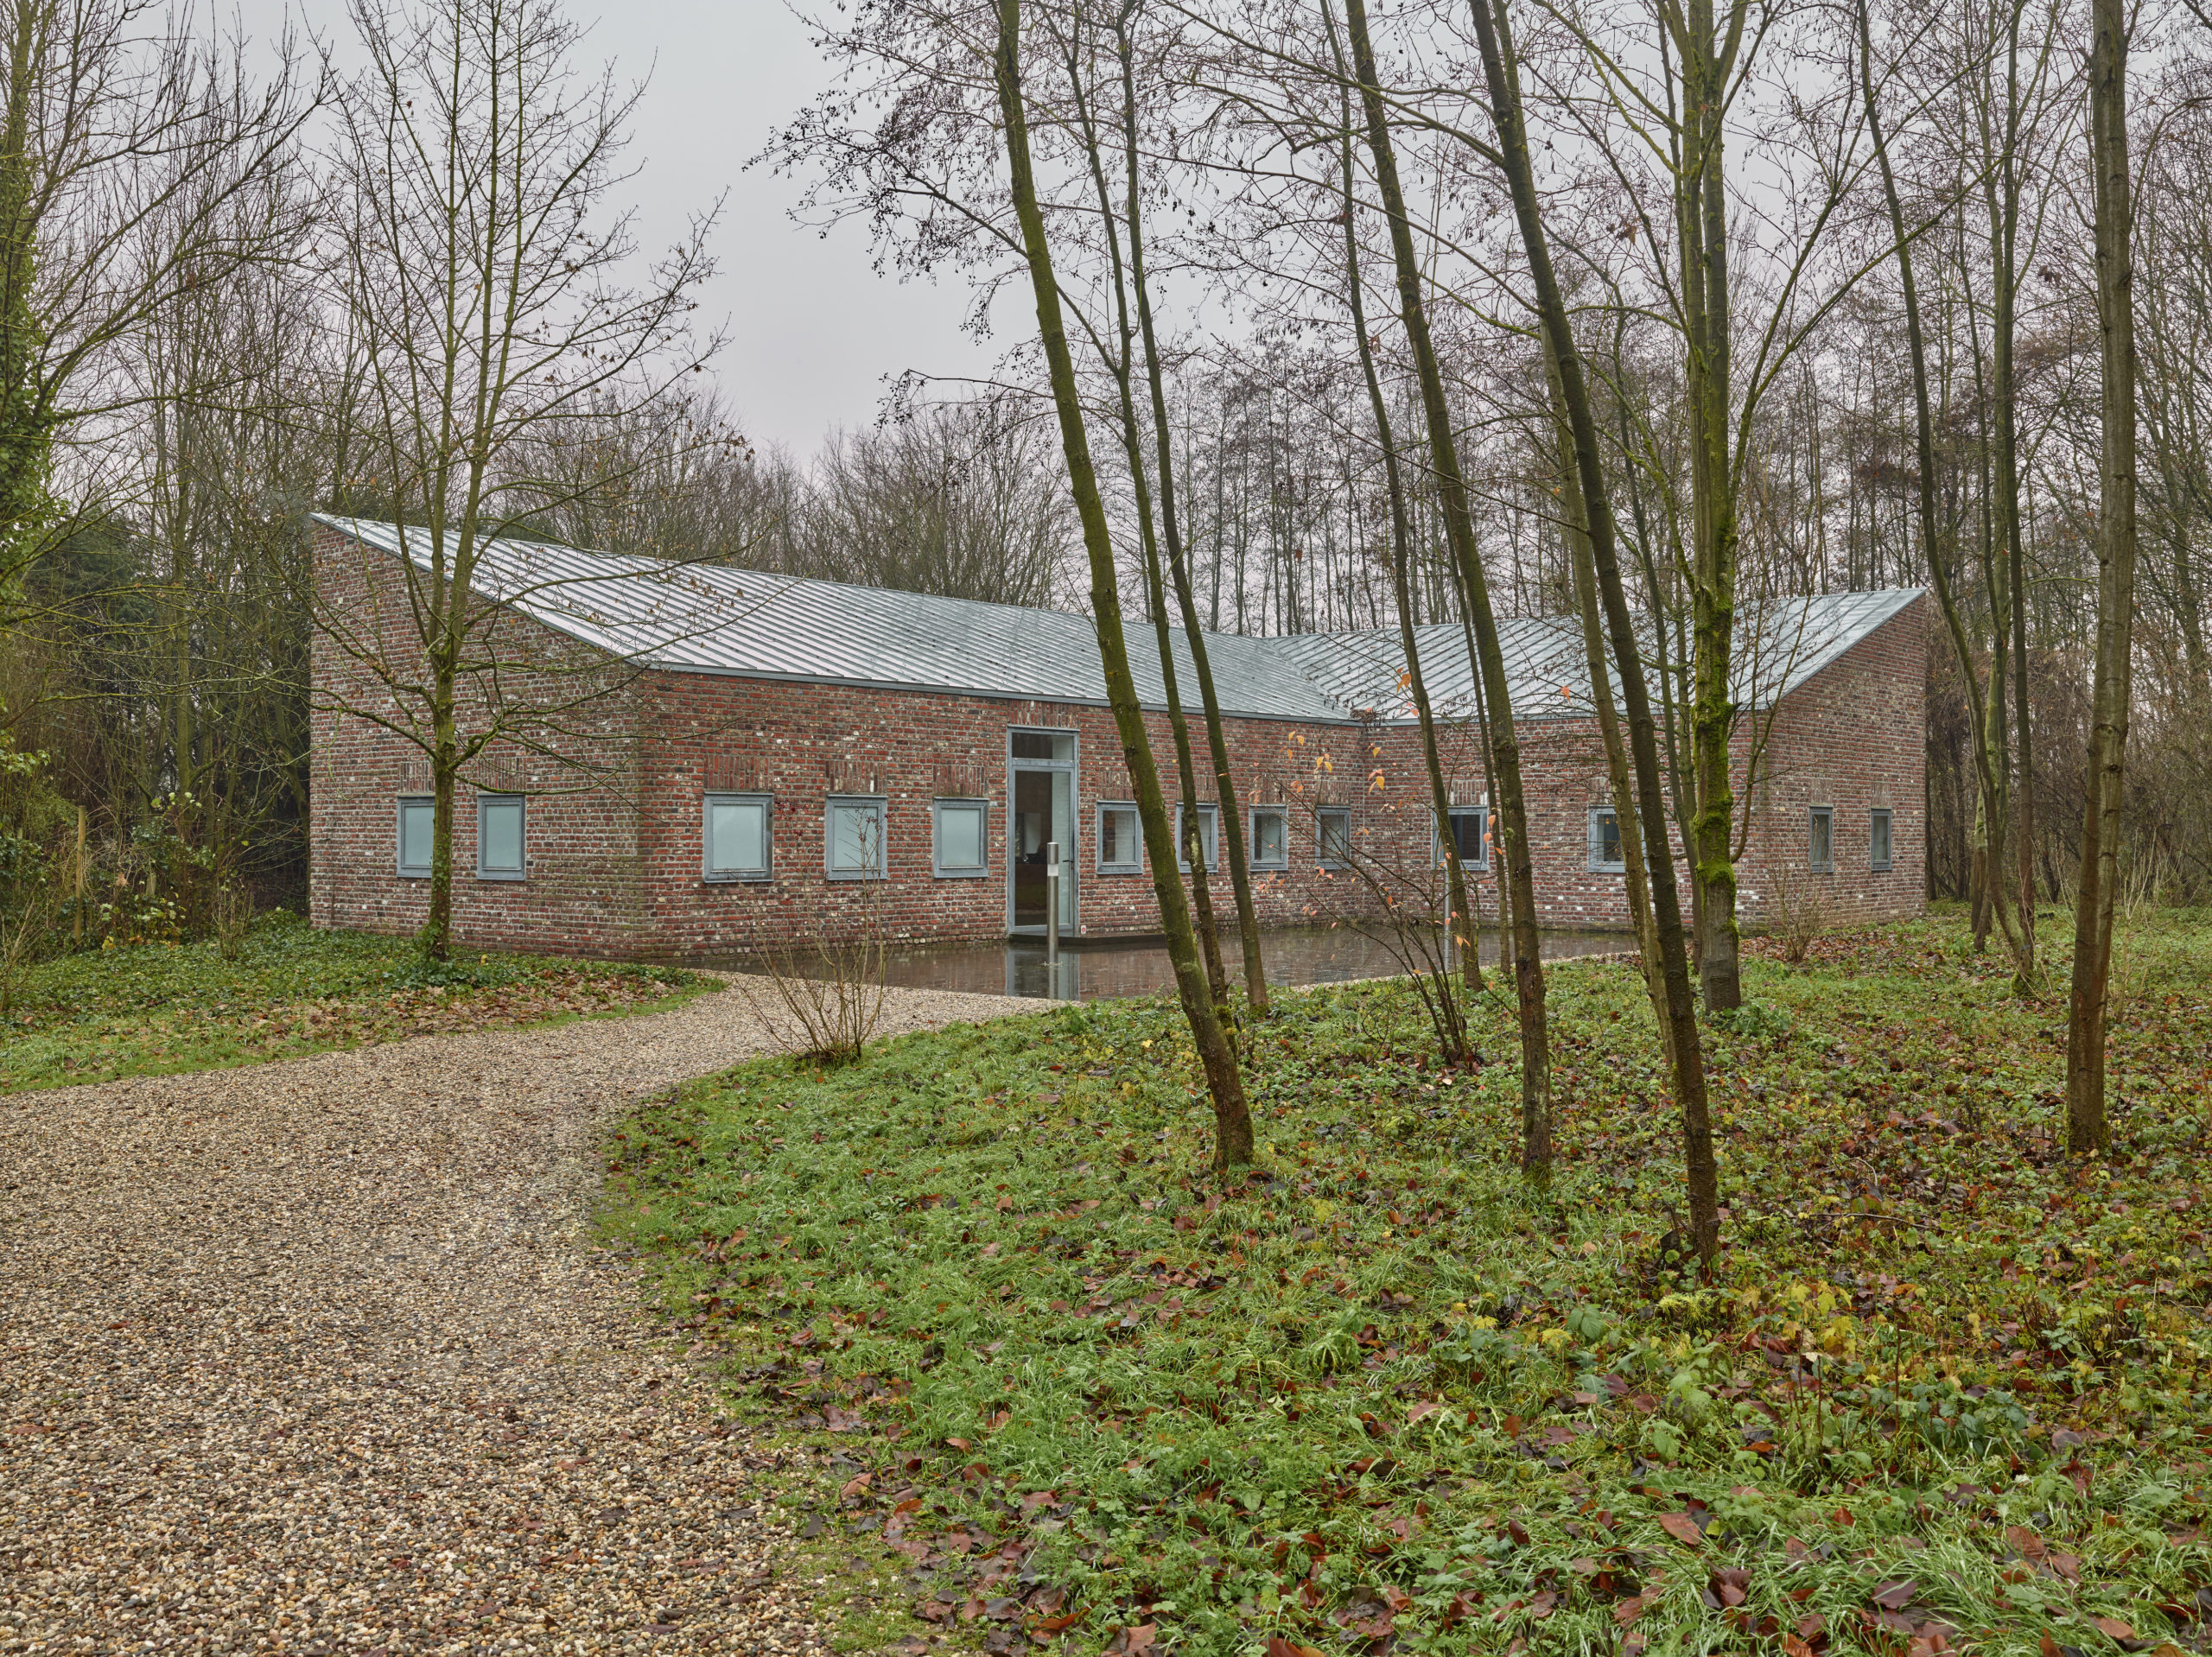 Museum Insel Hombroich; Kassenhaus, Architektur: Erwin Heerich ©Tomas Riehle